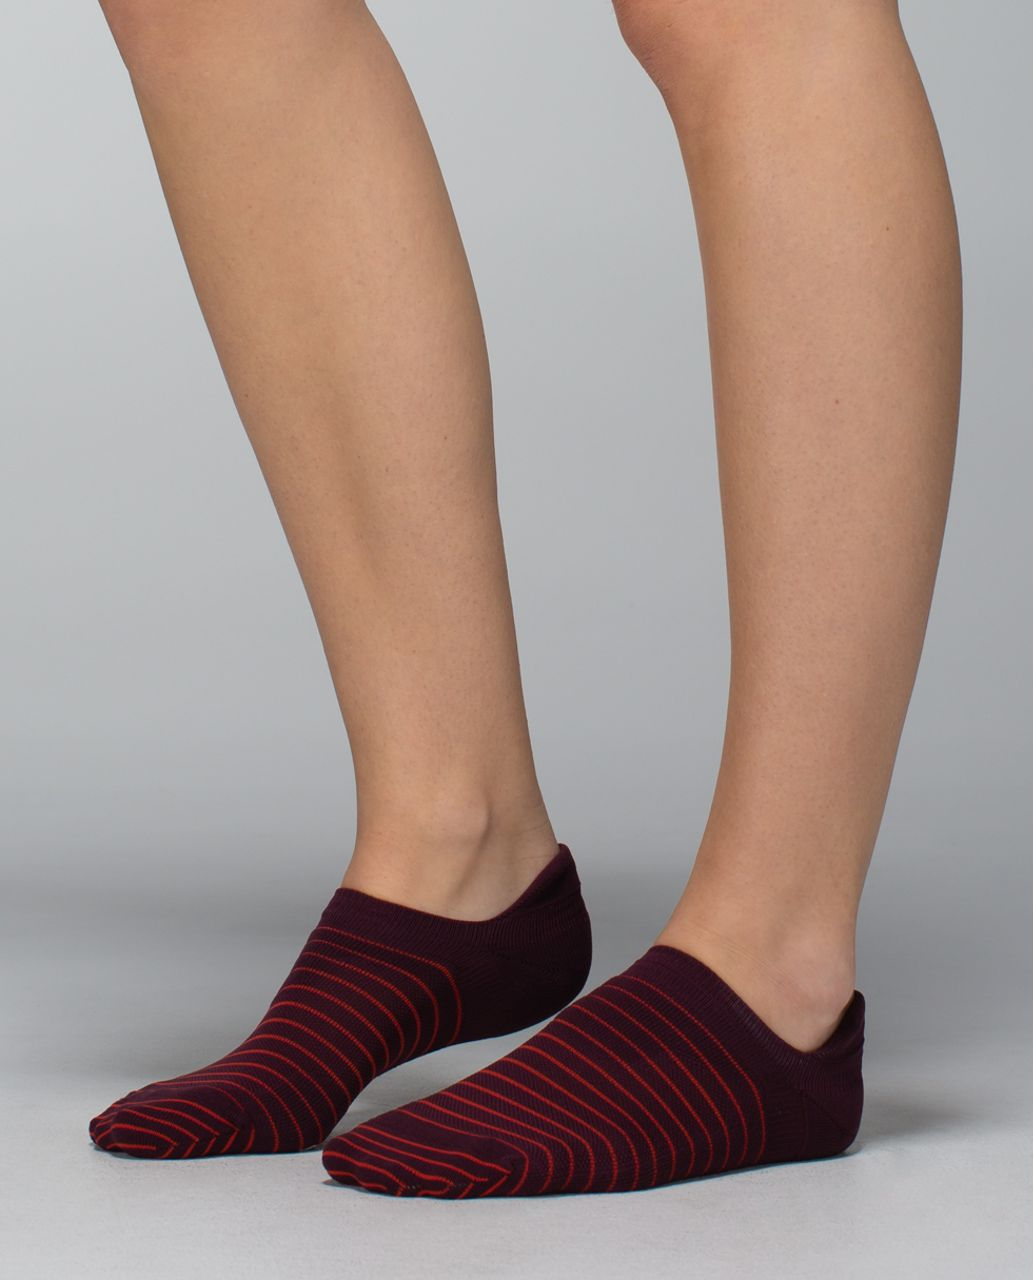 Lululemon Women's Ultimate No Show Run Sock *Ergo Toes - 2x8 Bordeaux Drama